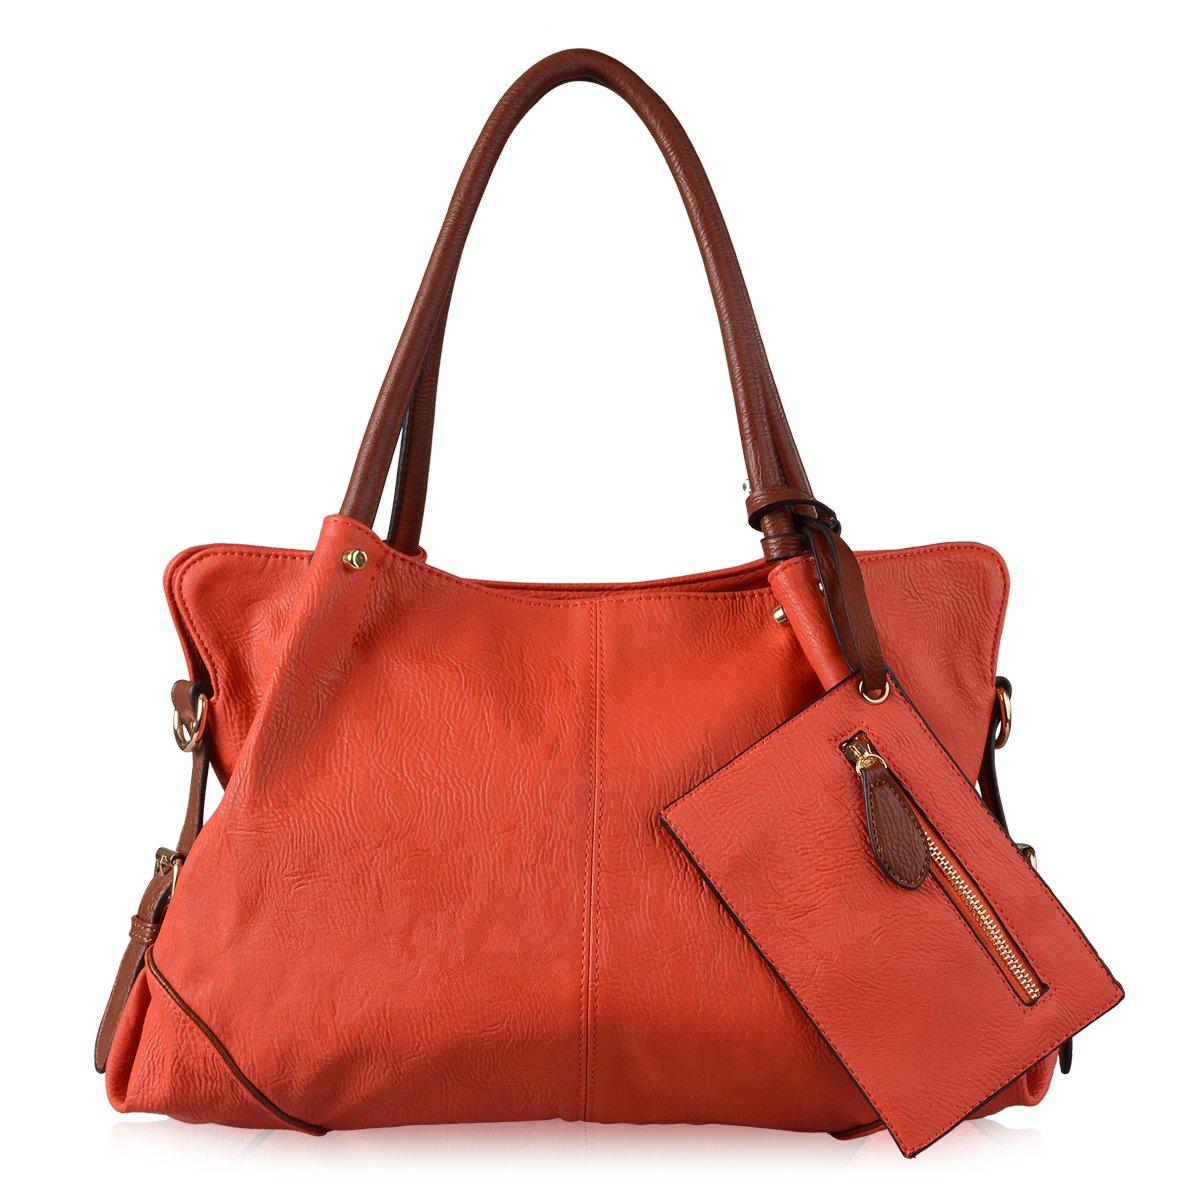 AB Earth 3 Pieces Women Hobo Handbag PU Leather Totes Matching Wallet Satchel Shoulder Bag, M898 (Orange)